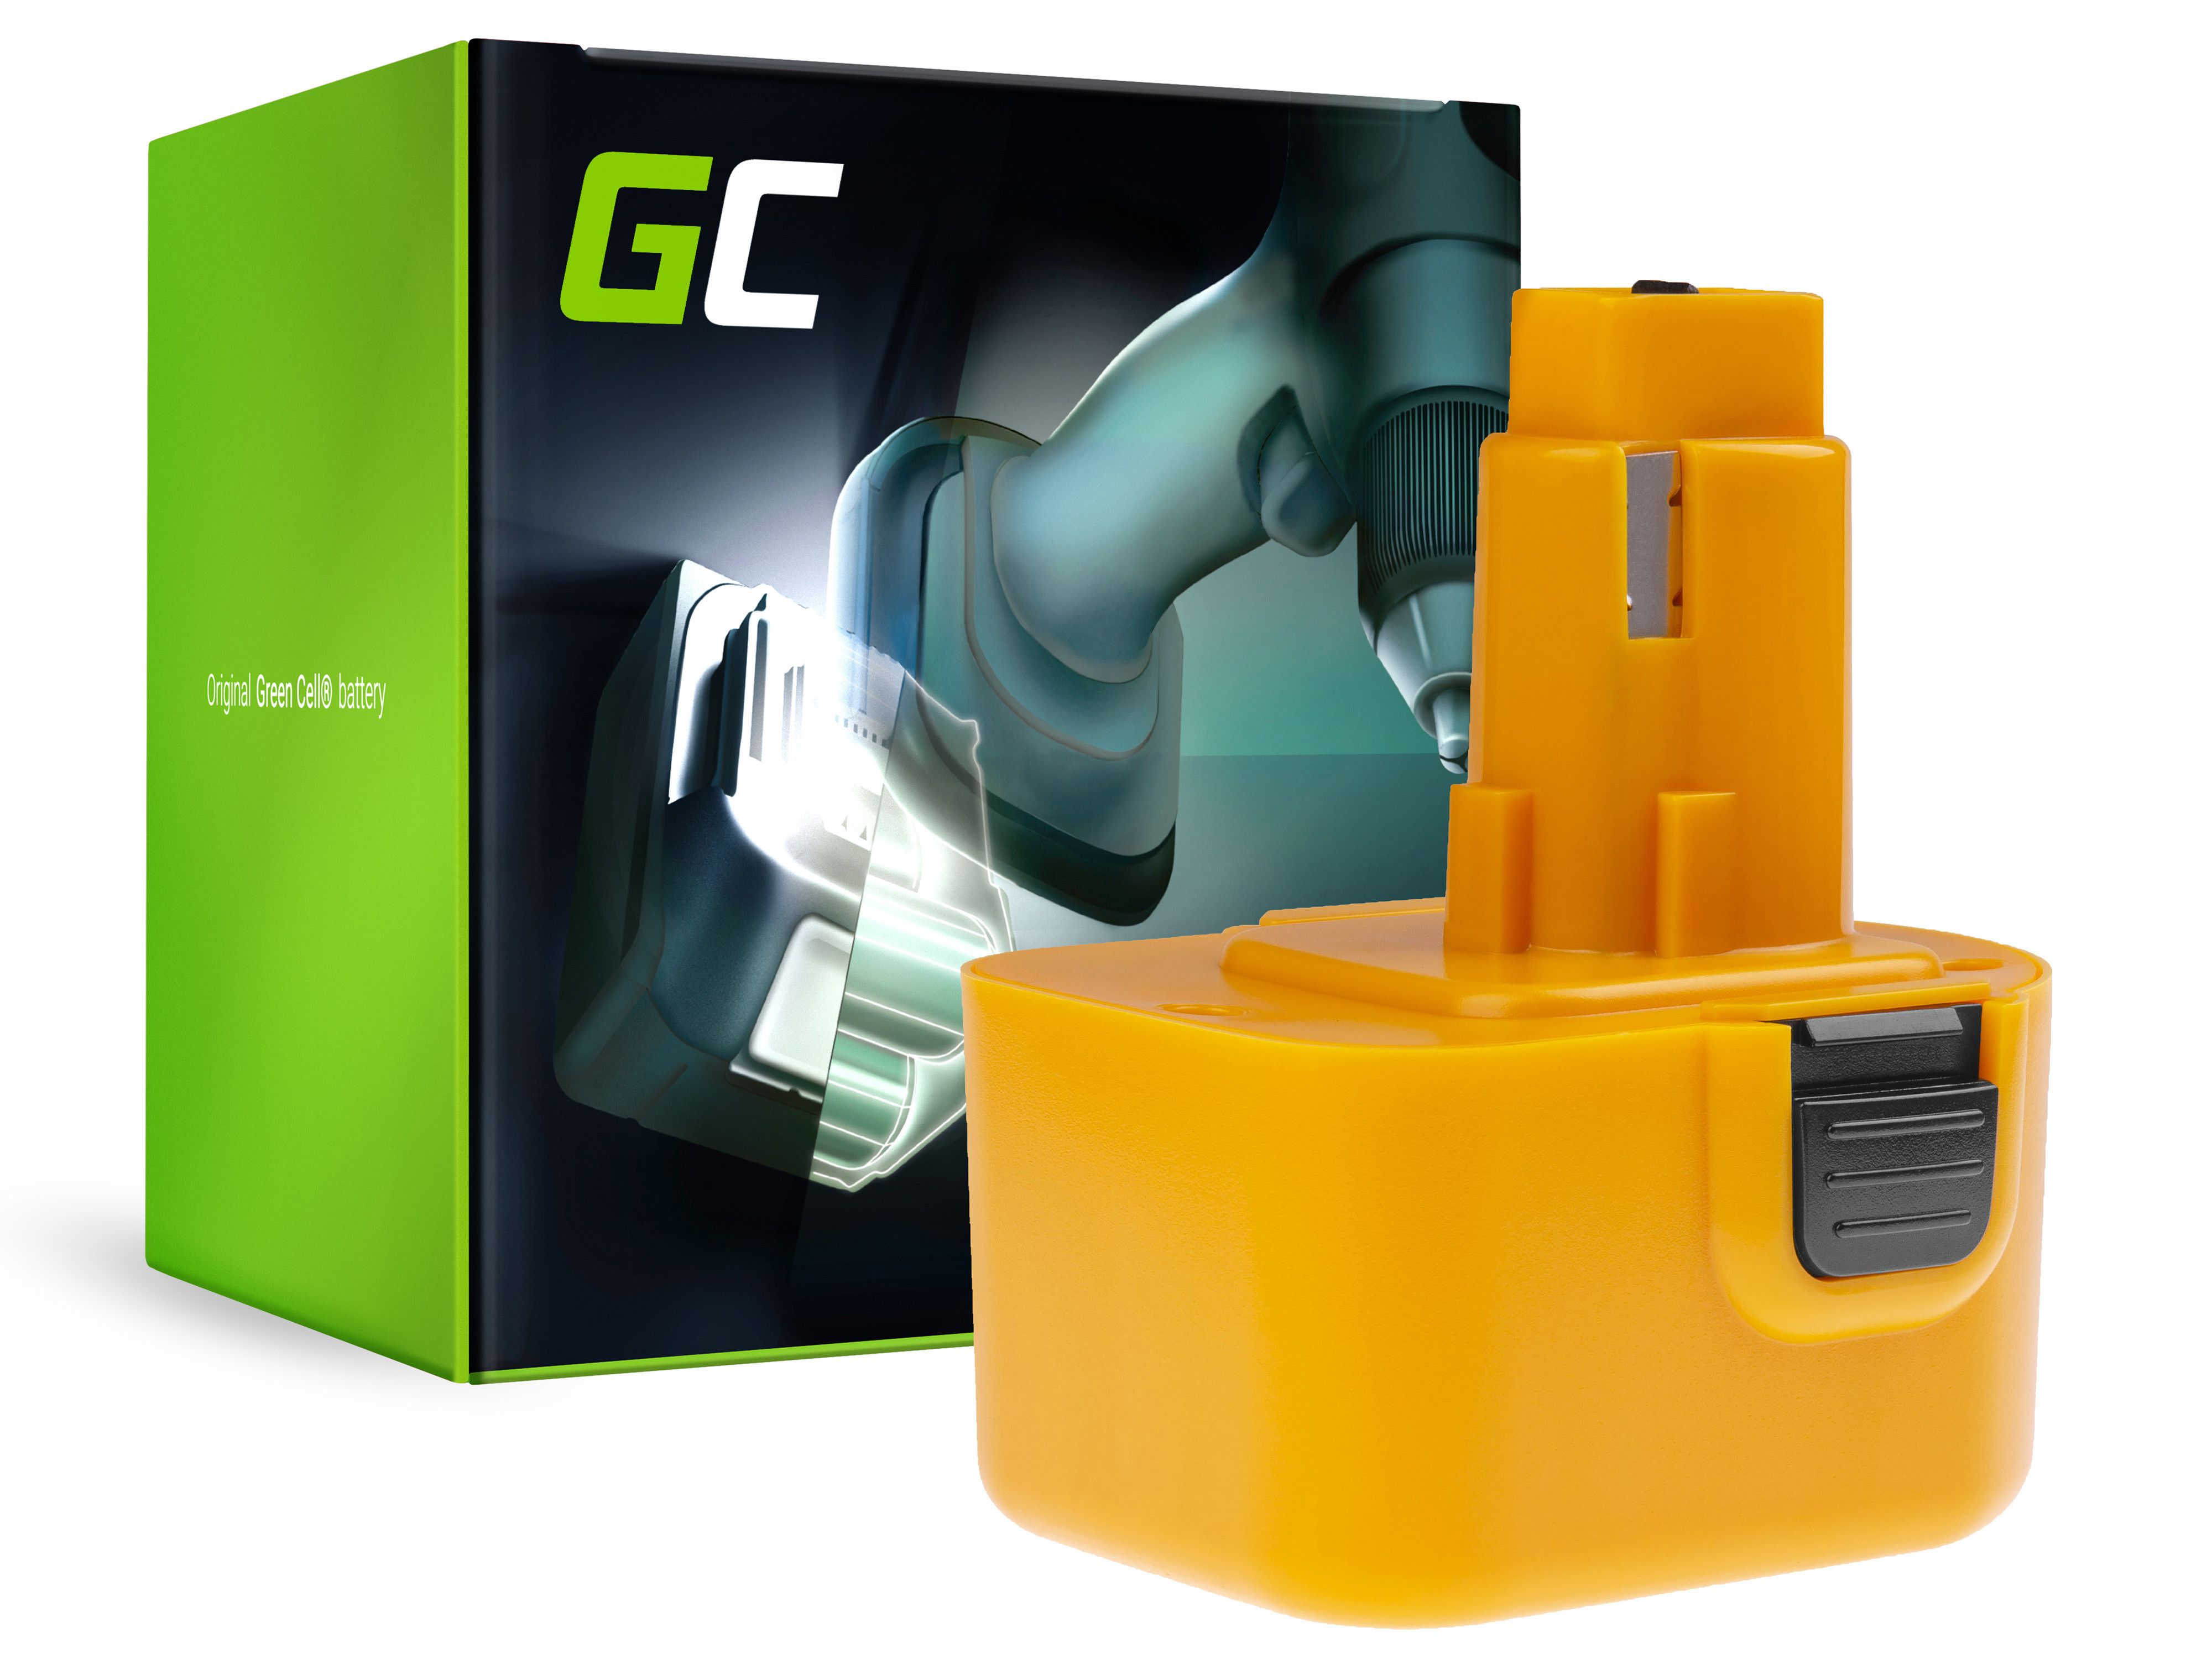 Baterie Green Cell DeWalt DE9037 DE9071 DE9074 12V 2000mAh Ni-MH – neoriginální